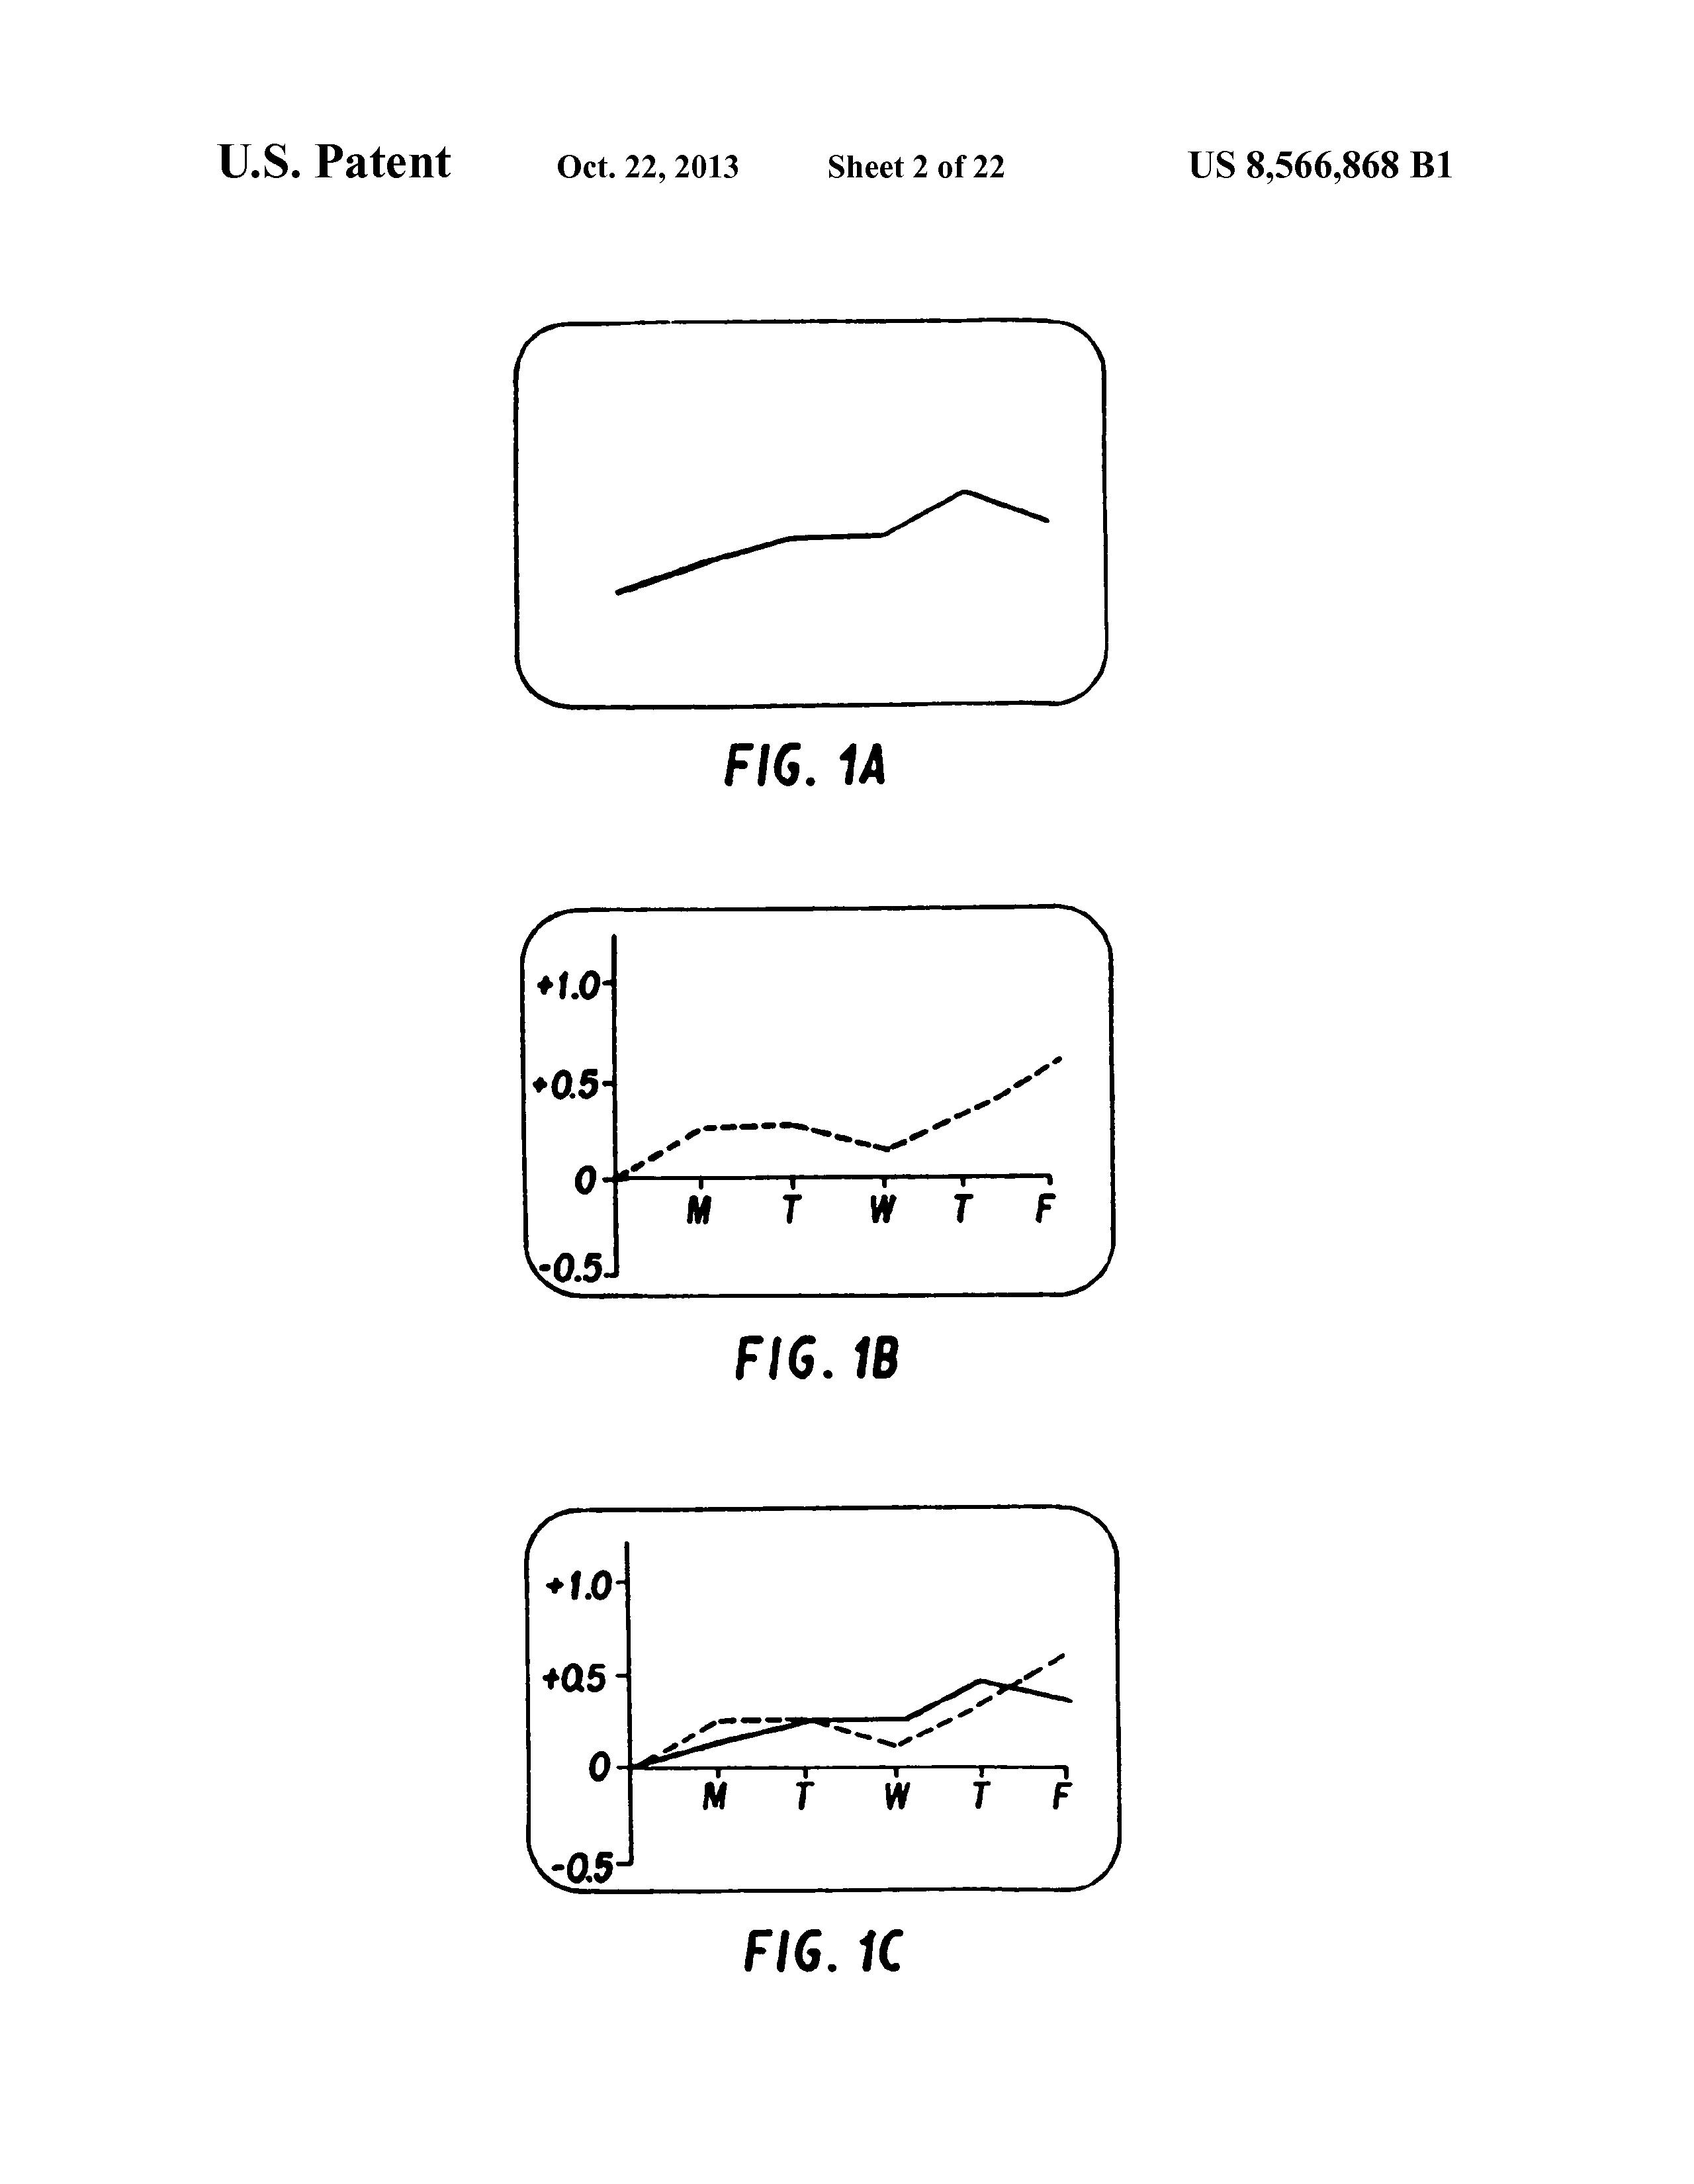 US8566868B1 - Signal processing apparatus and methods - Google Patents